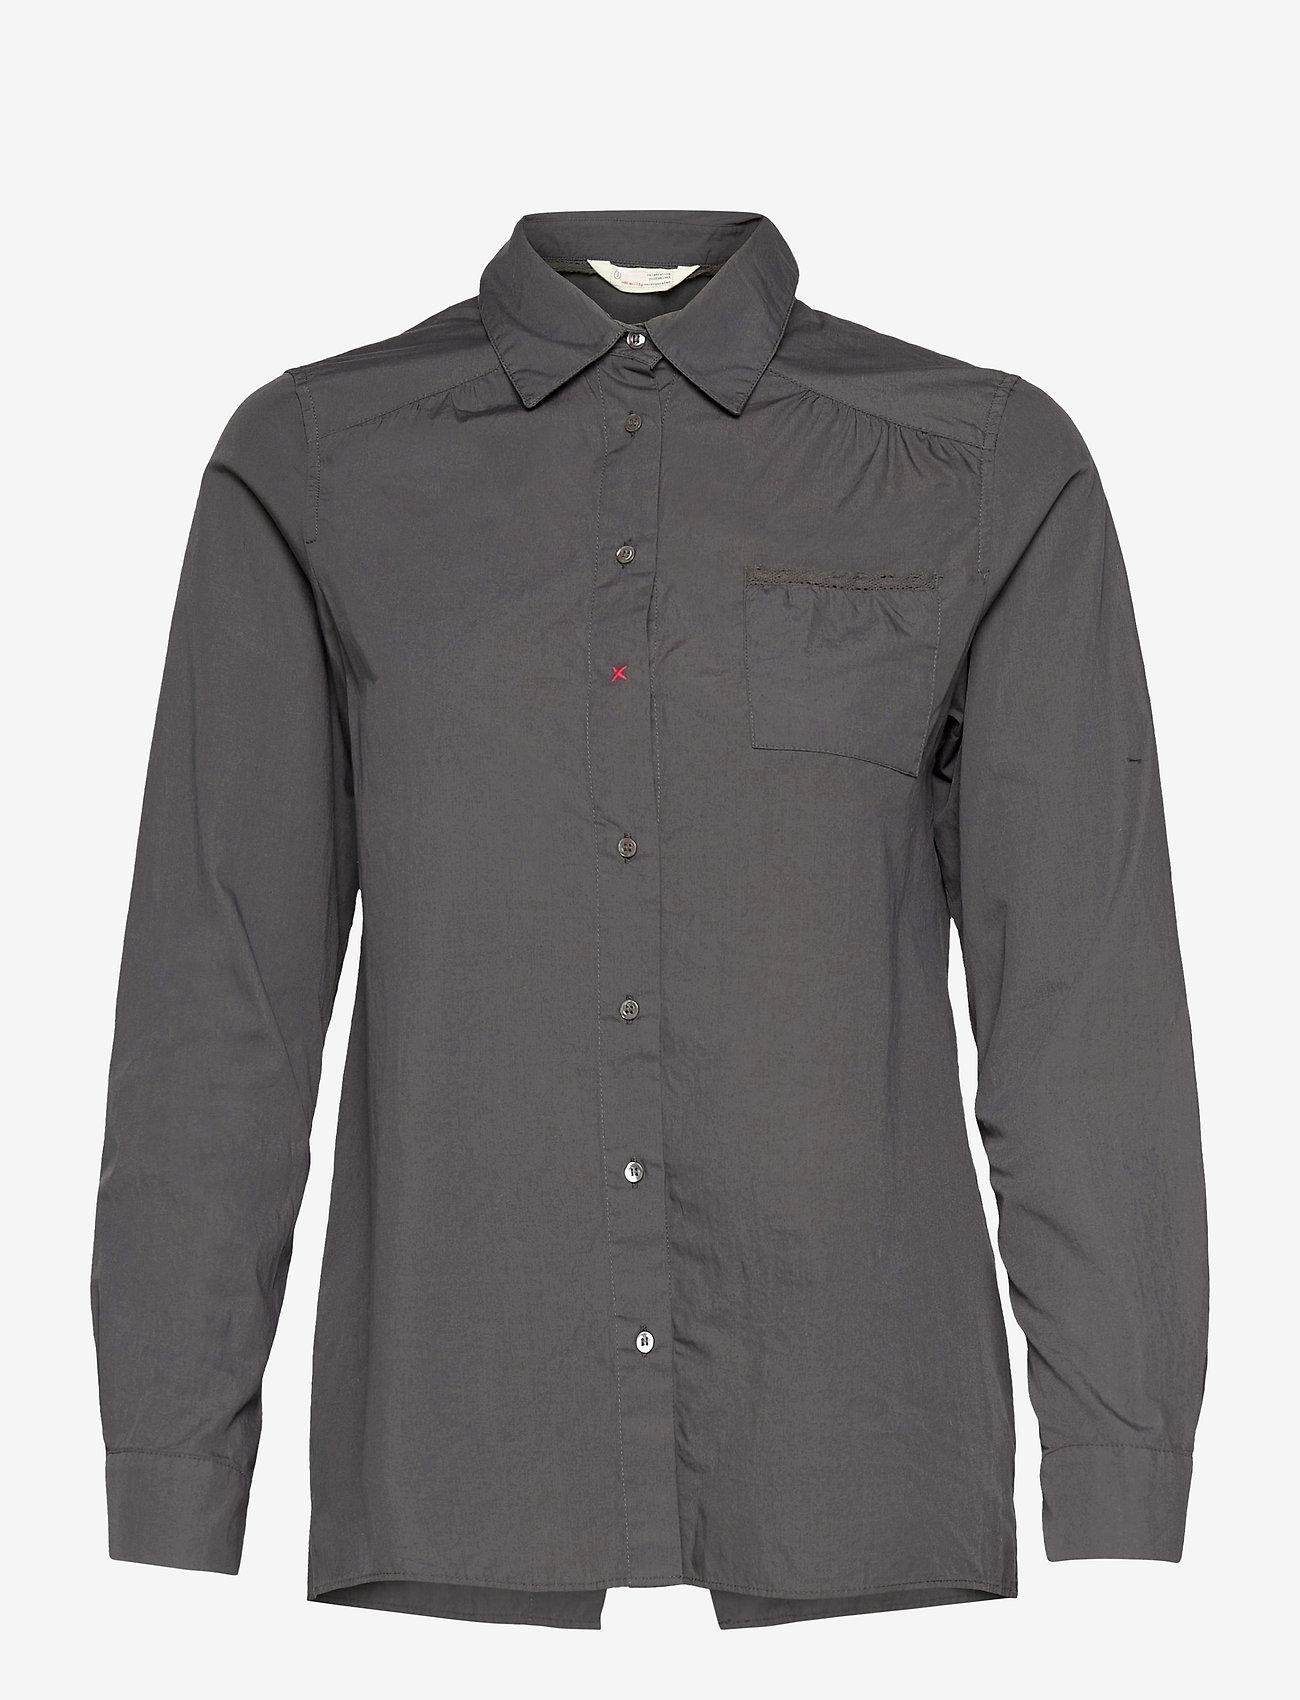 ODD MOLLY - Willow Shirt - long-sleeved shirts - asphalt - 1